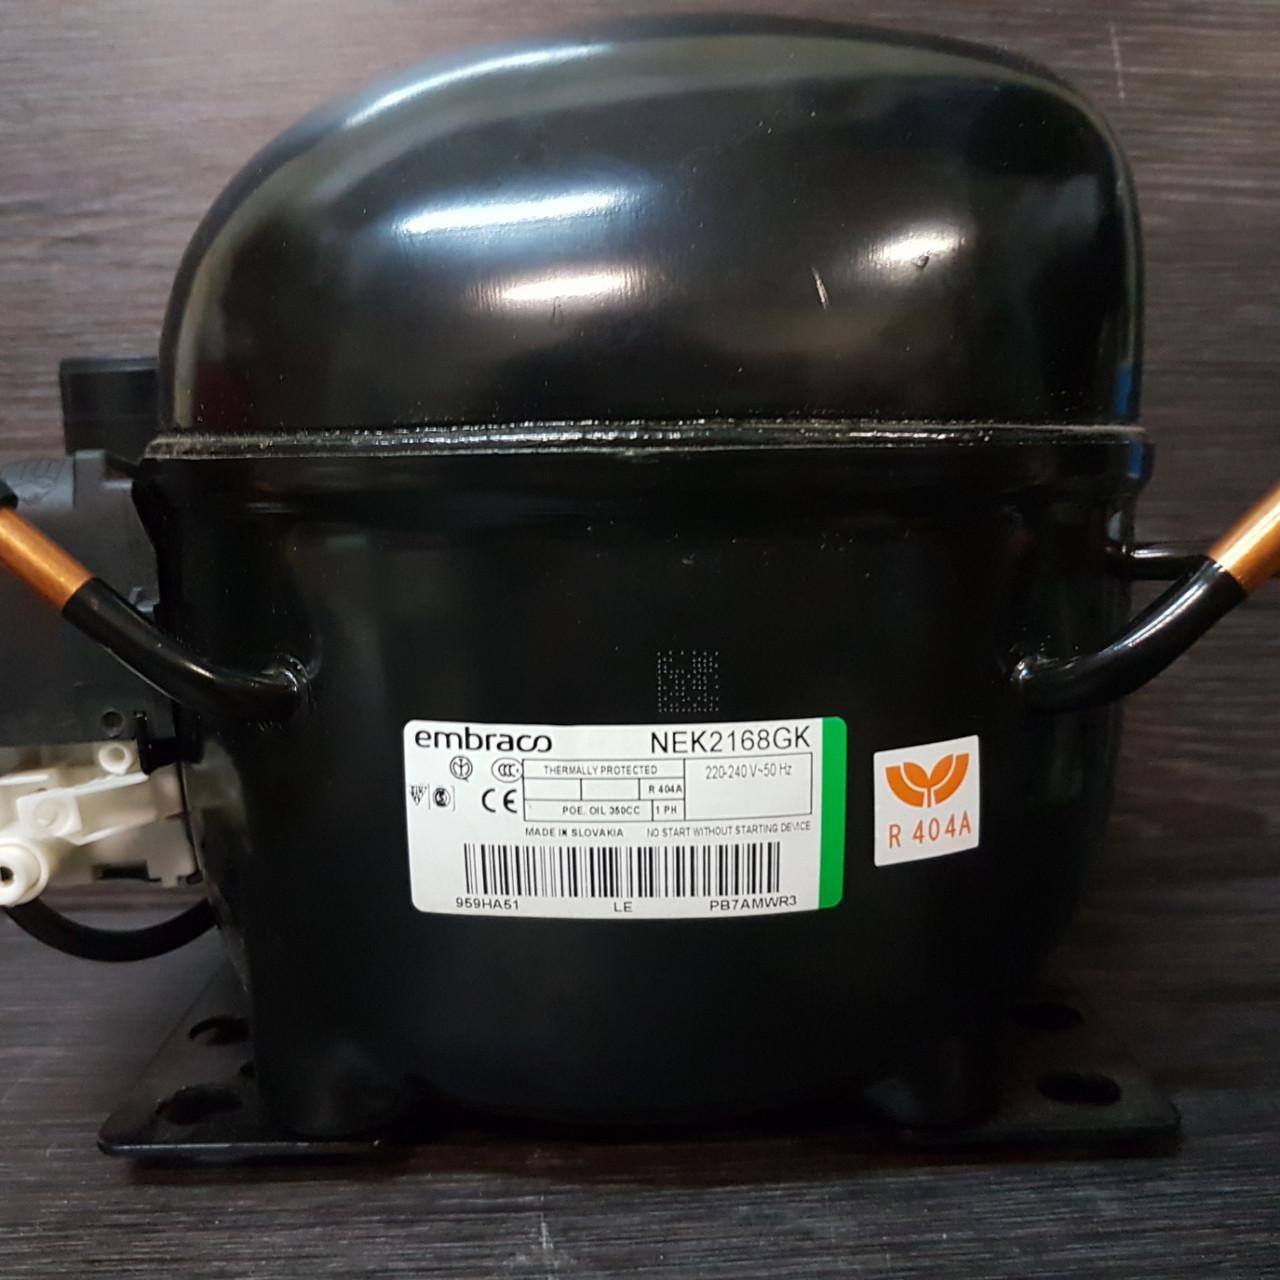 Компрессор Embraco Aspera NEK 2168GK